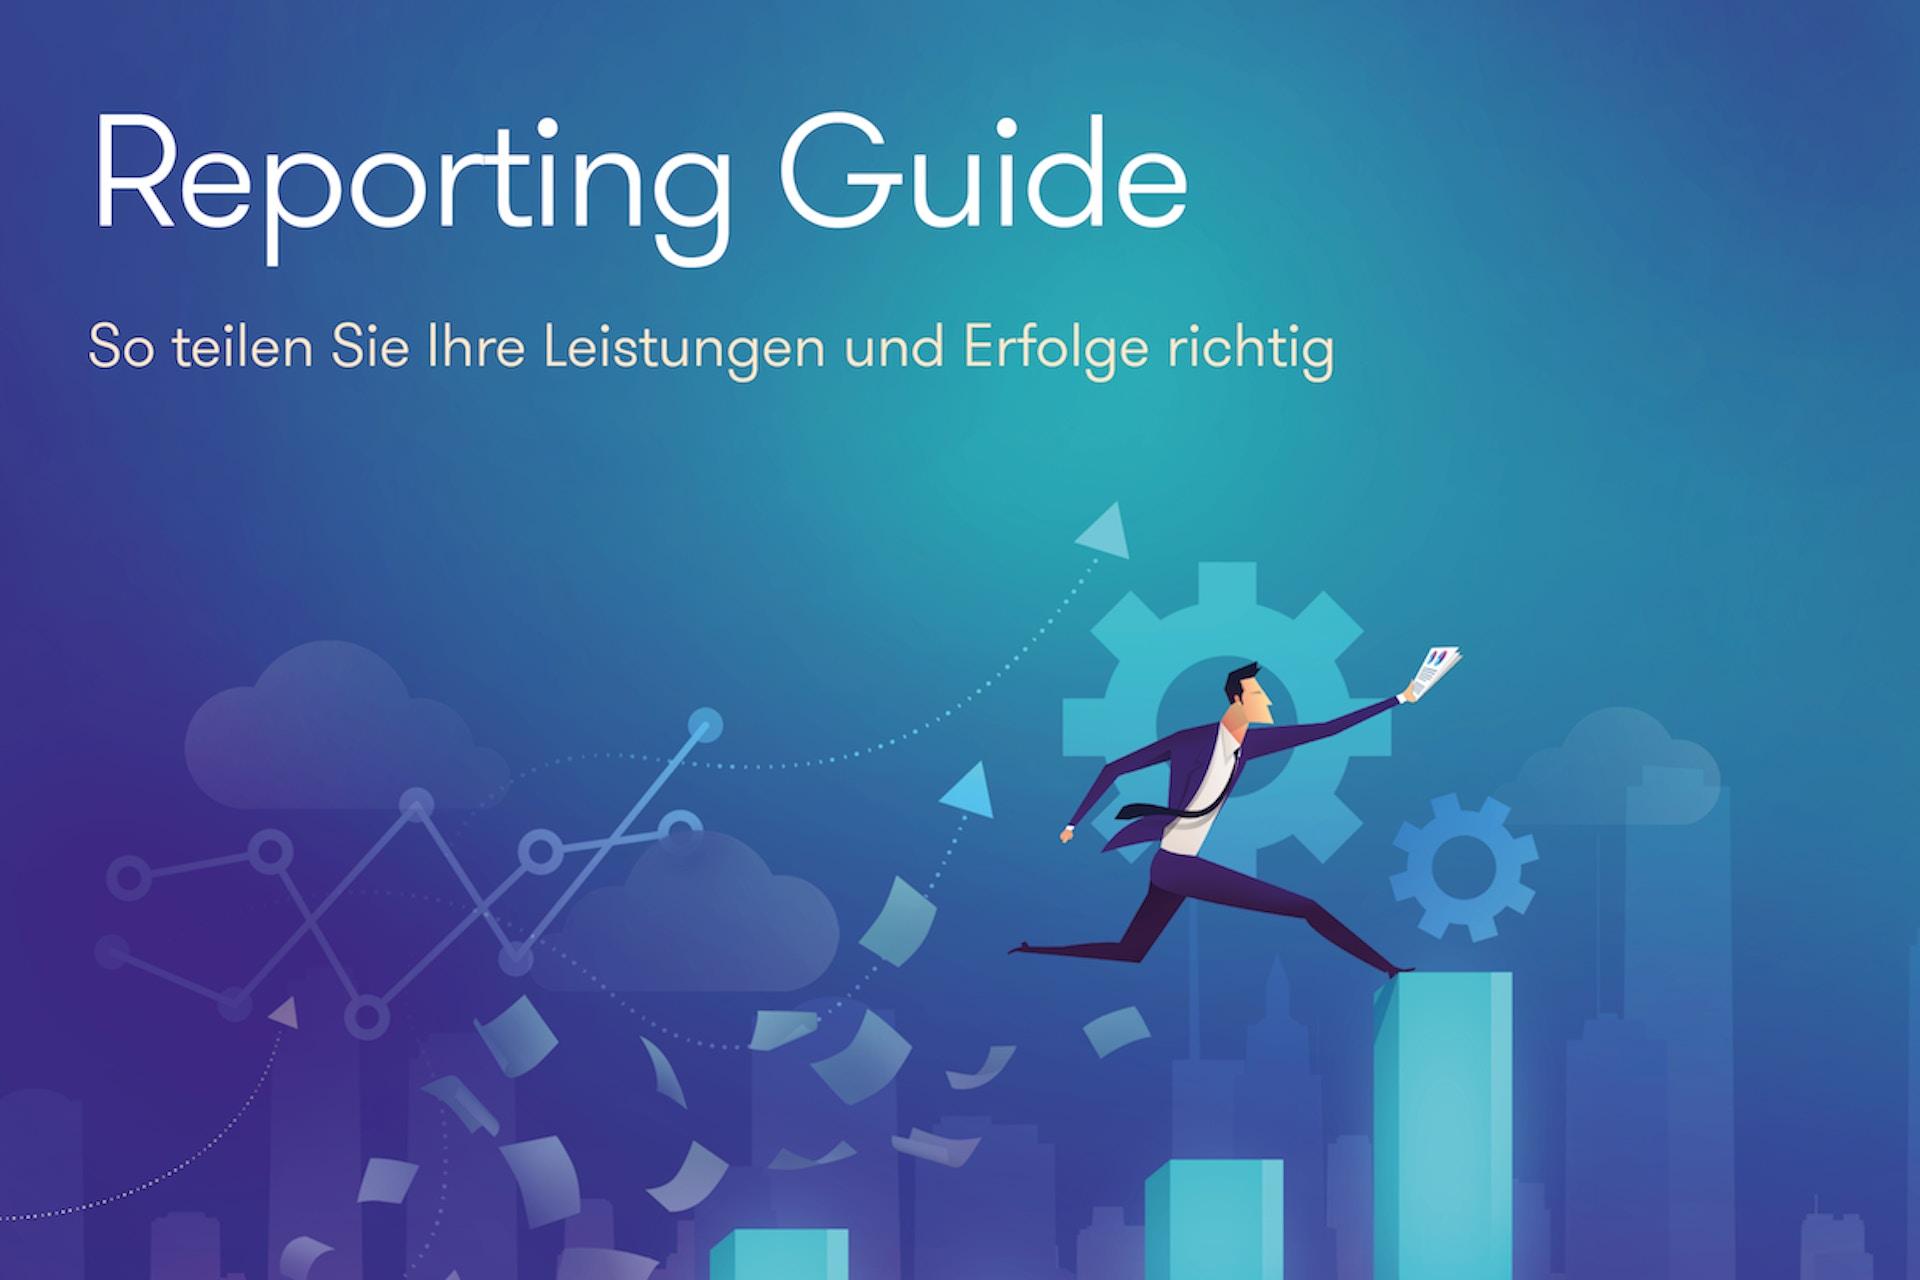 Foto vom Reporting Guide